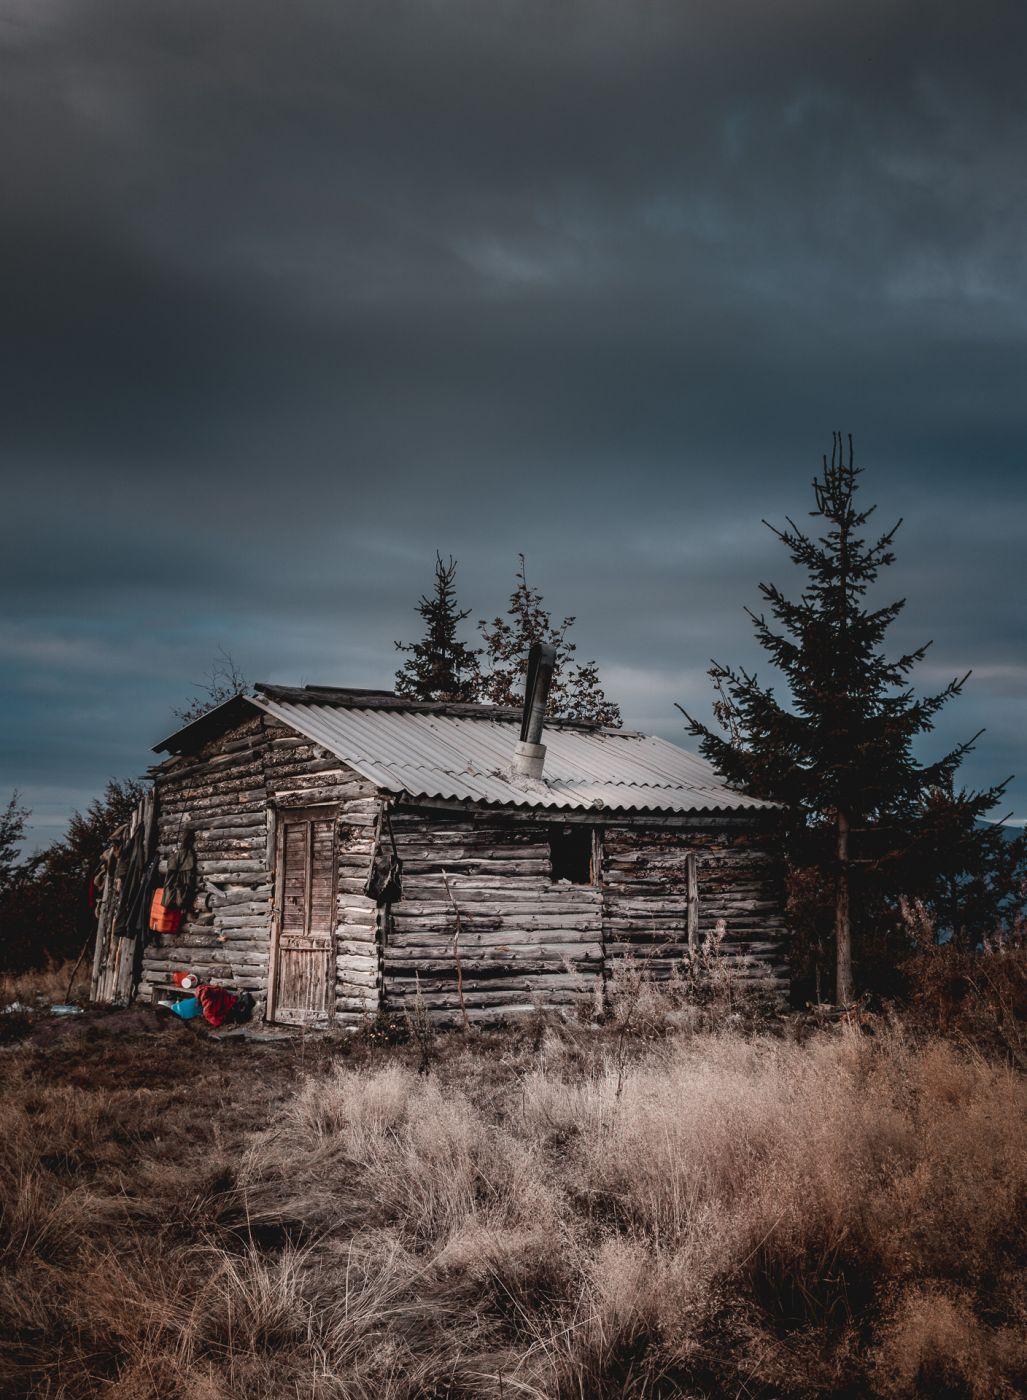 Mountain Hut, Serbia